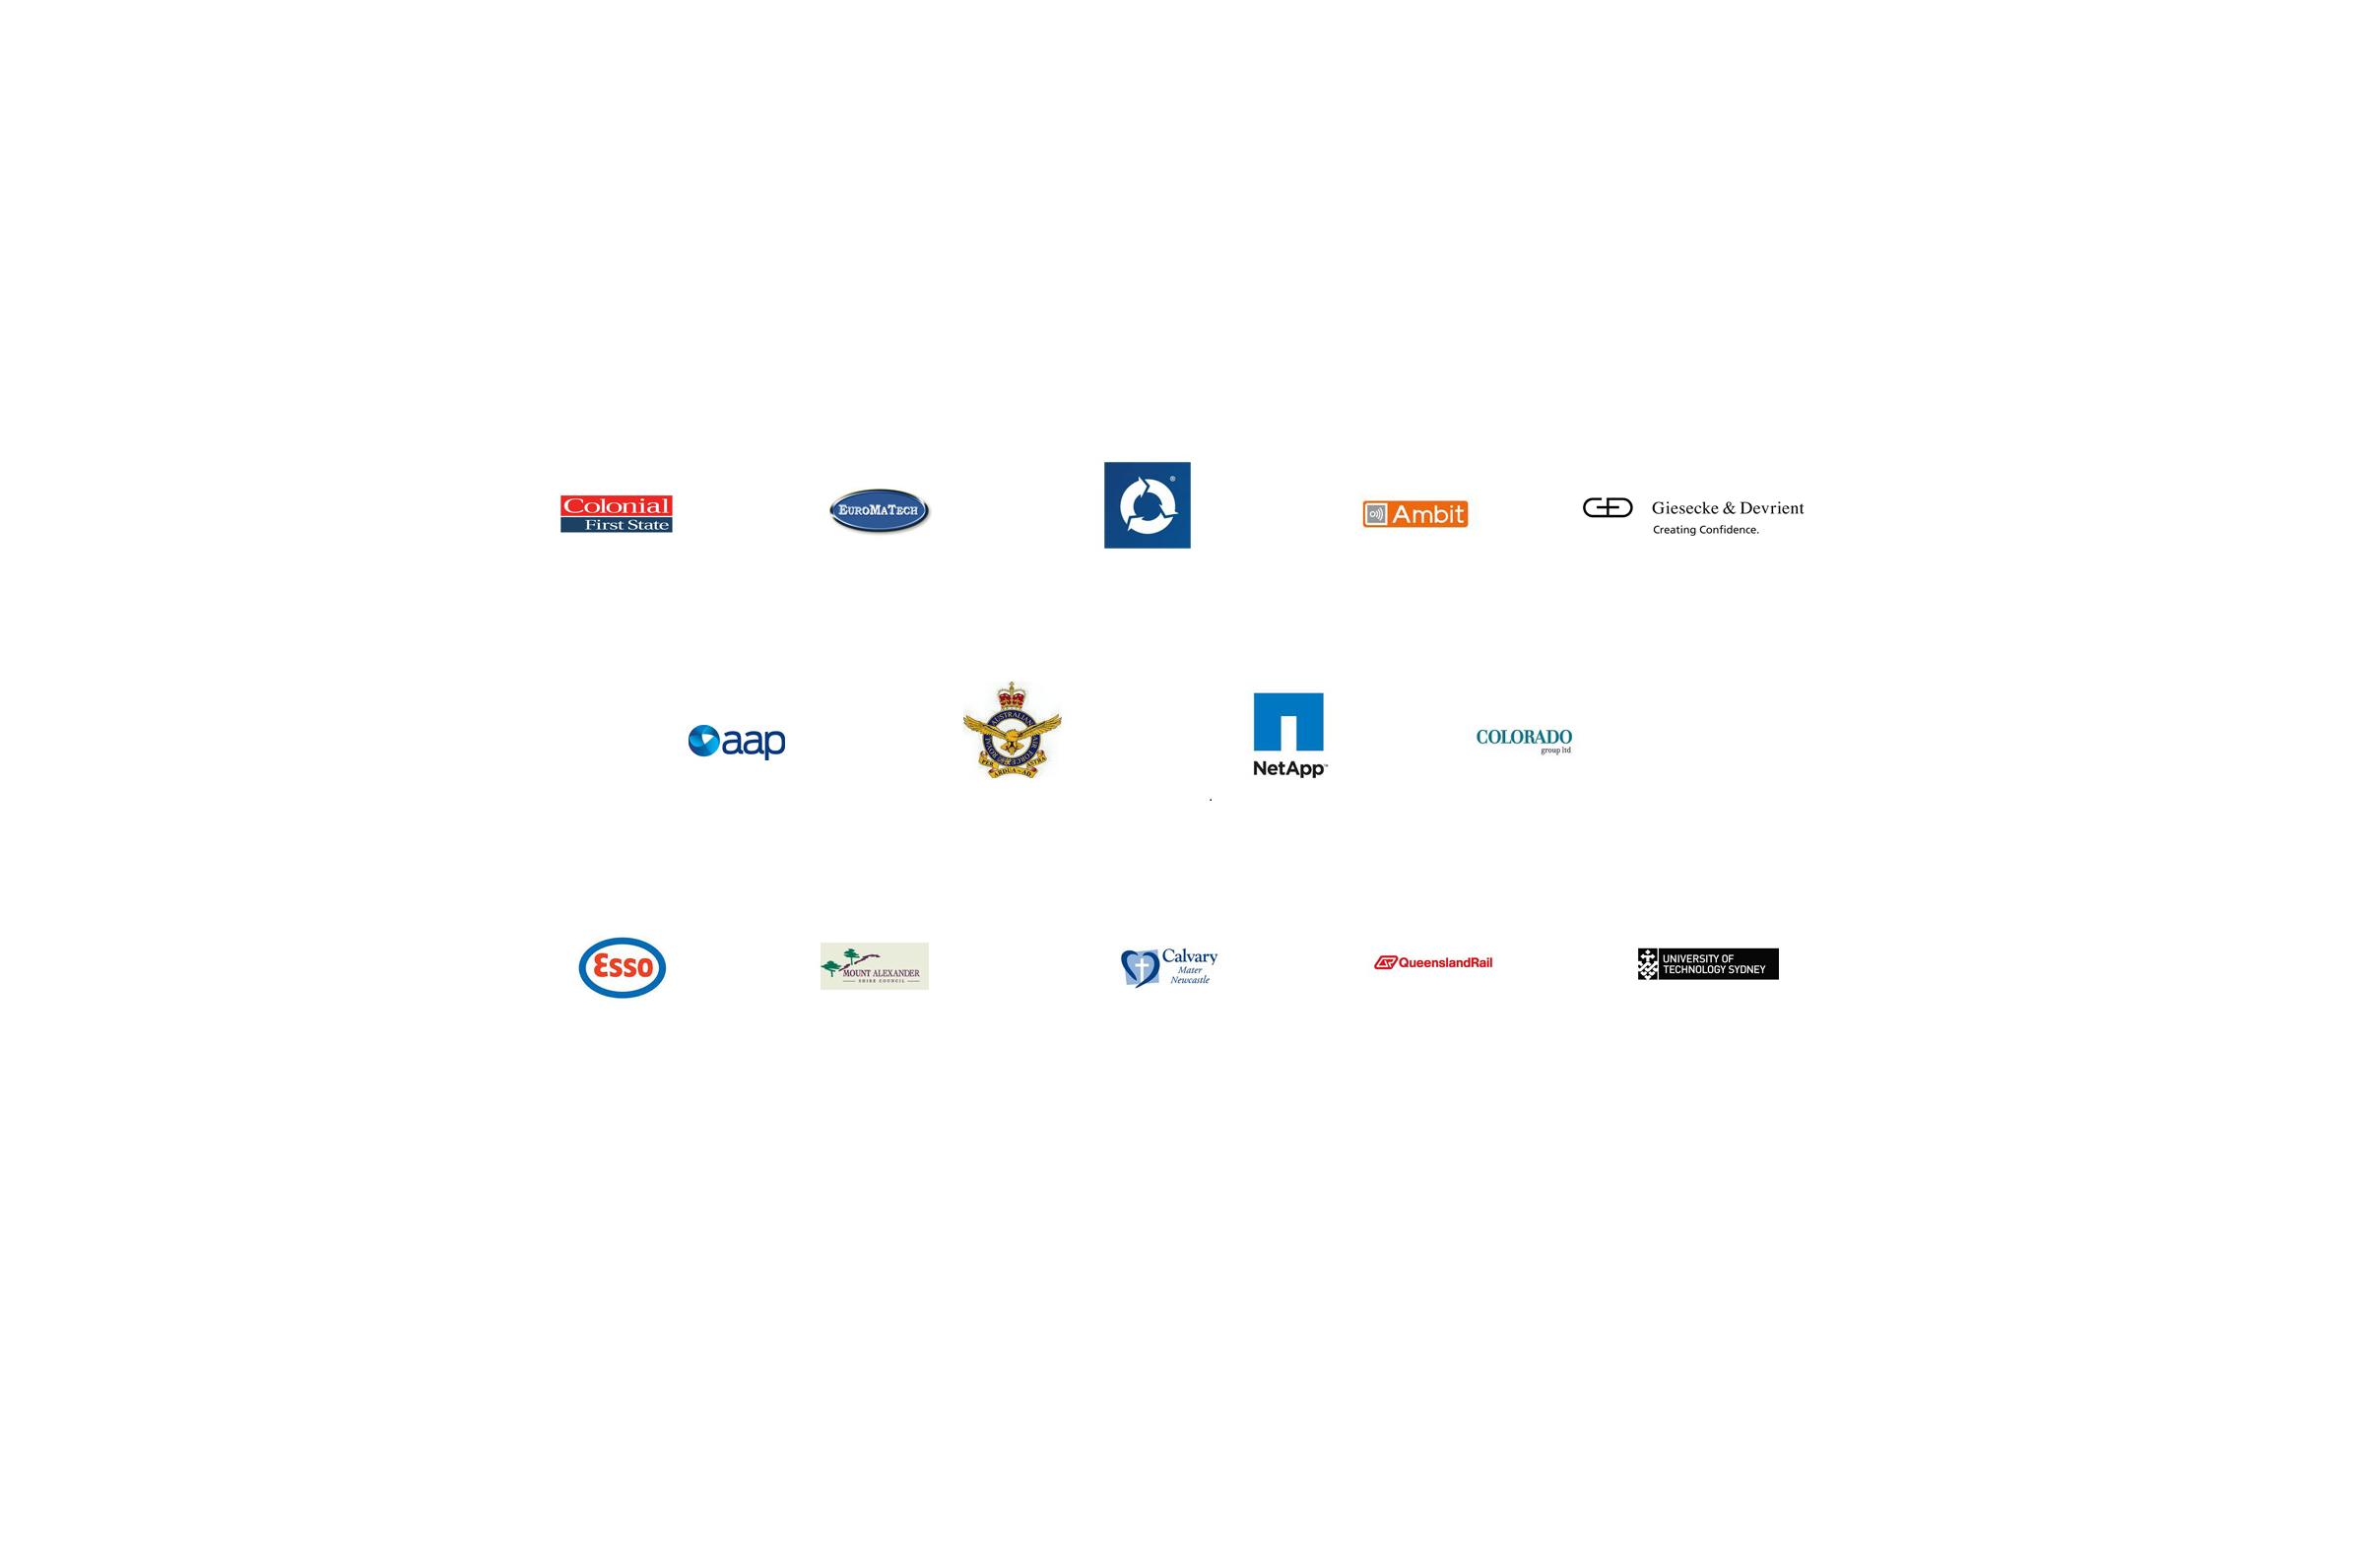 Partner logos 3 of 3.png